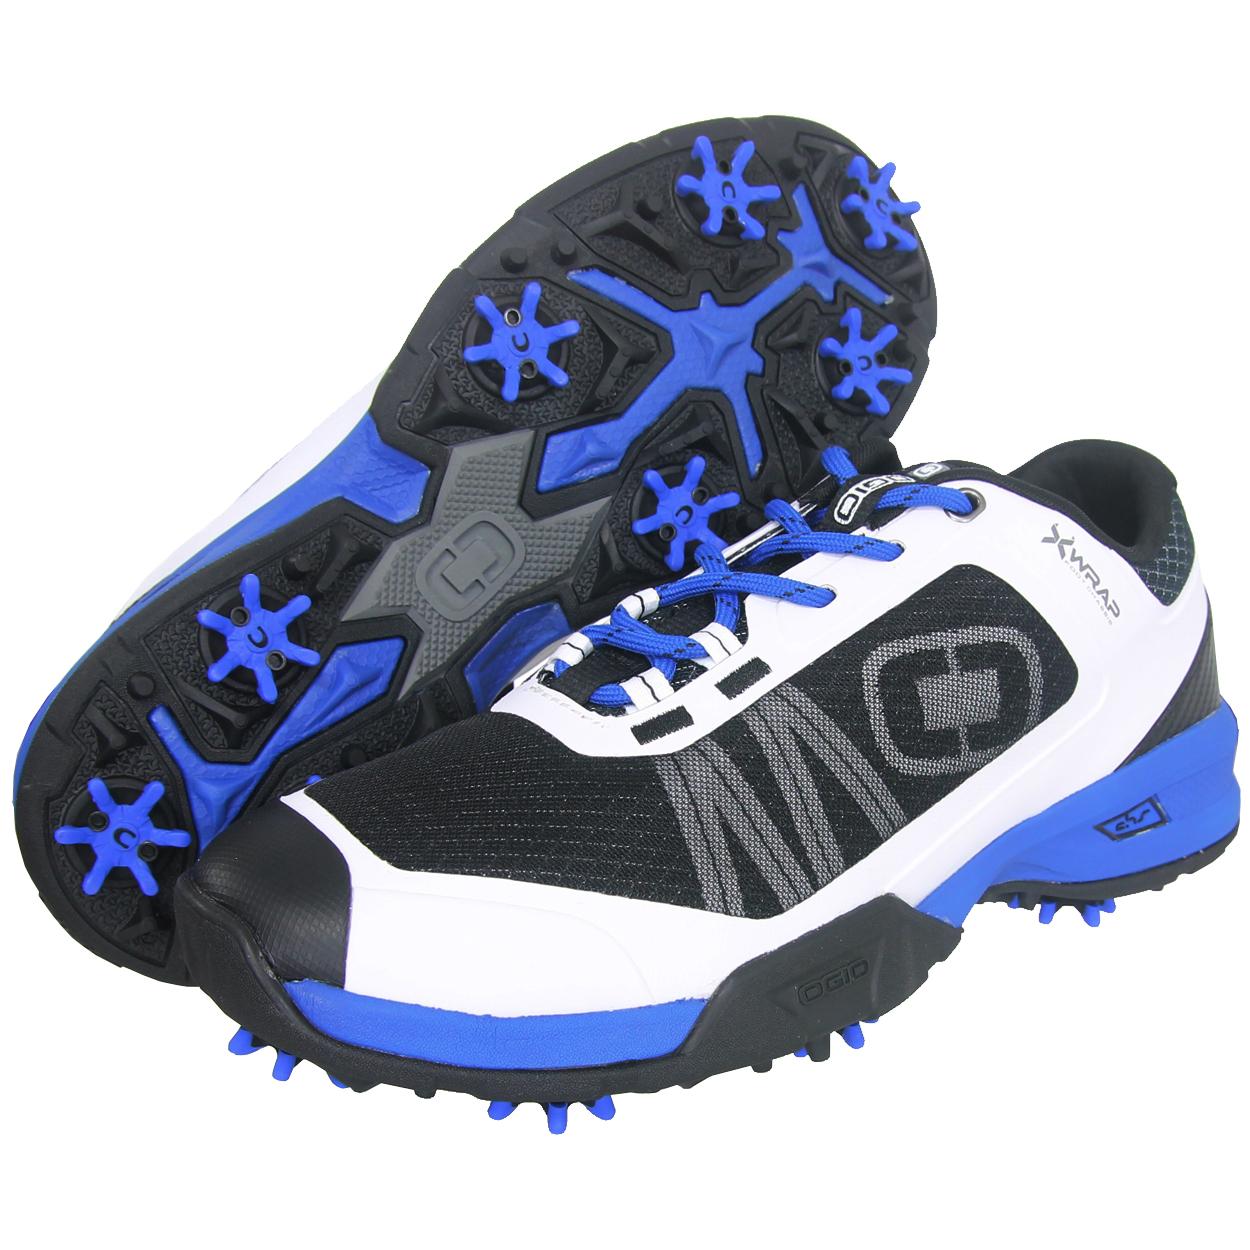 Ogio Sport Spiked Shoe